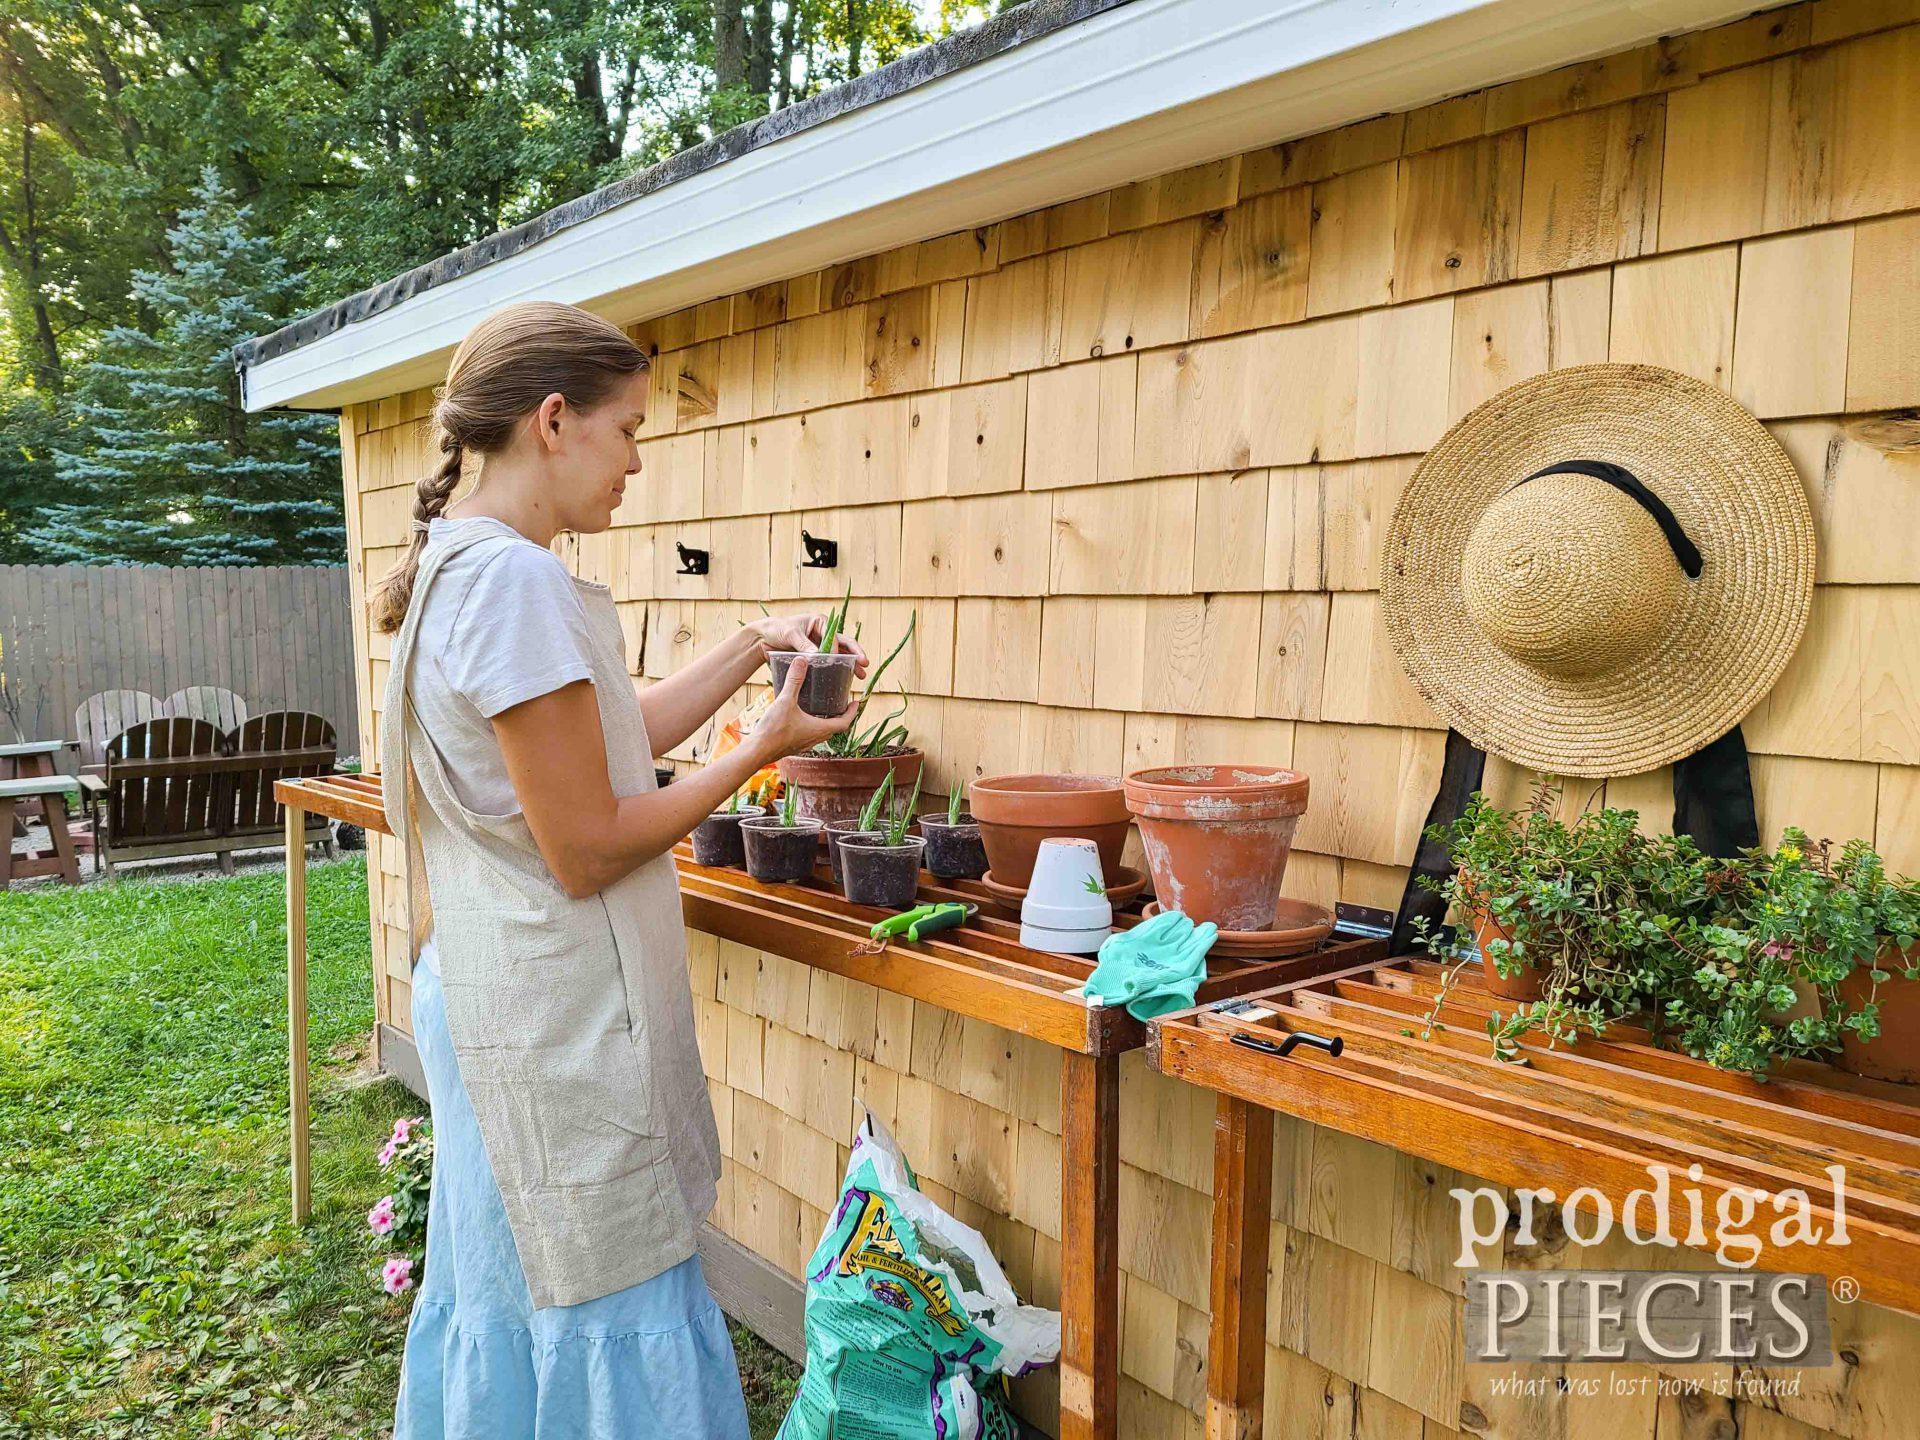 Larissa of Prodigal Pieces Gardening   prodigalpieces.com #prodigalpieces #garden #diy #homesteading